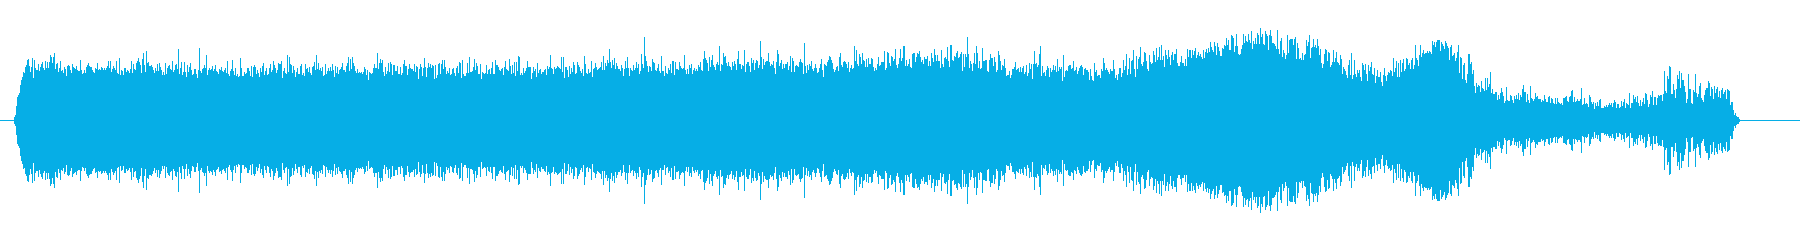 Gnat:アイドル/アウェイ。中程...の再生済みの波形